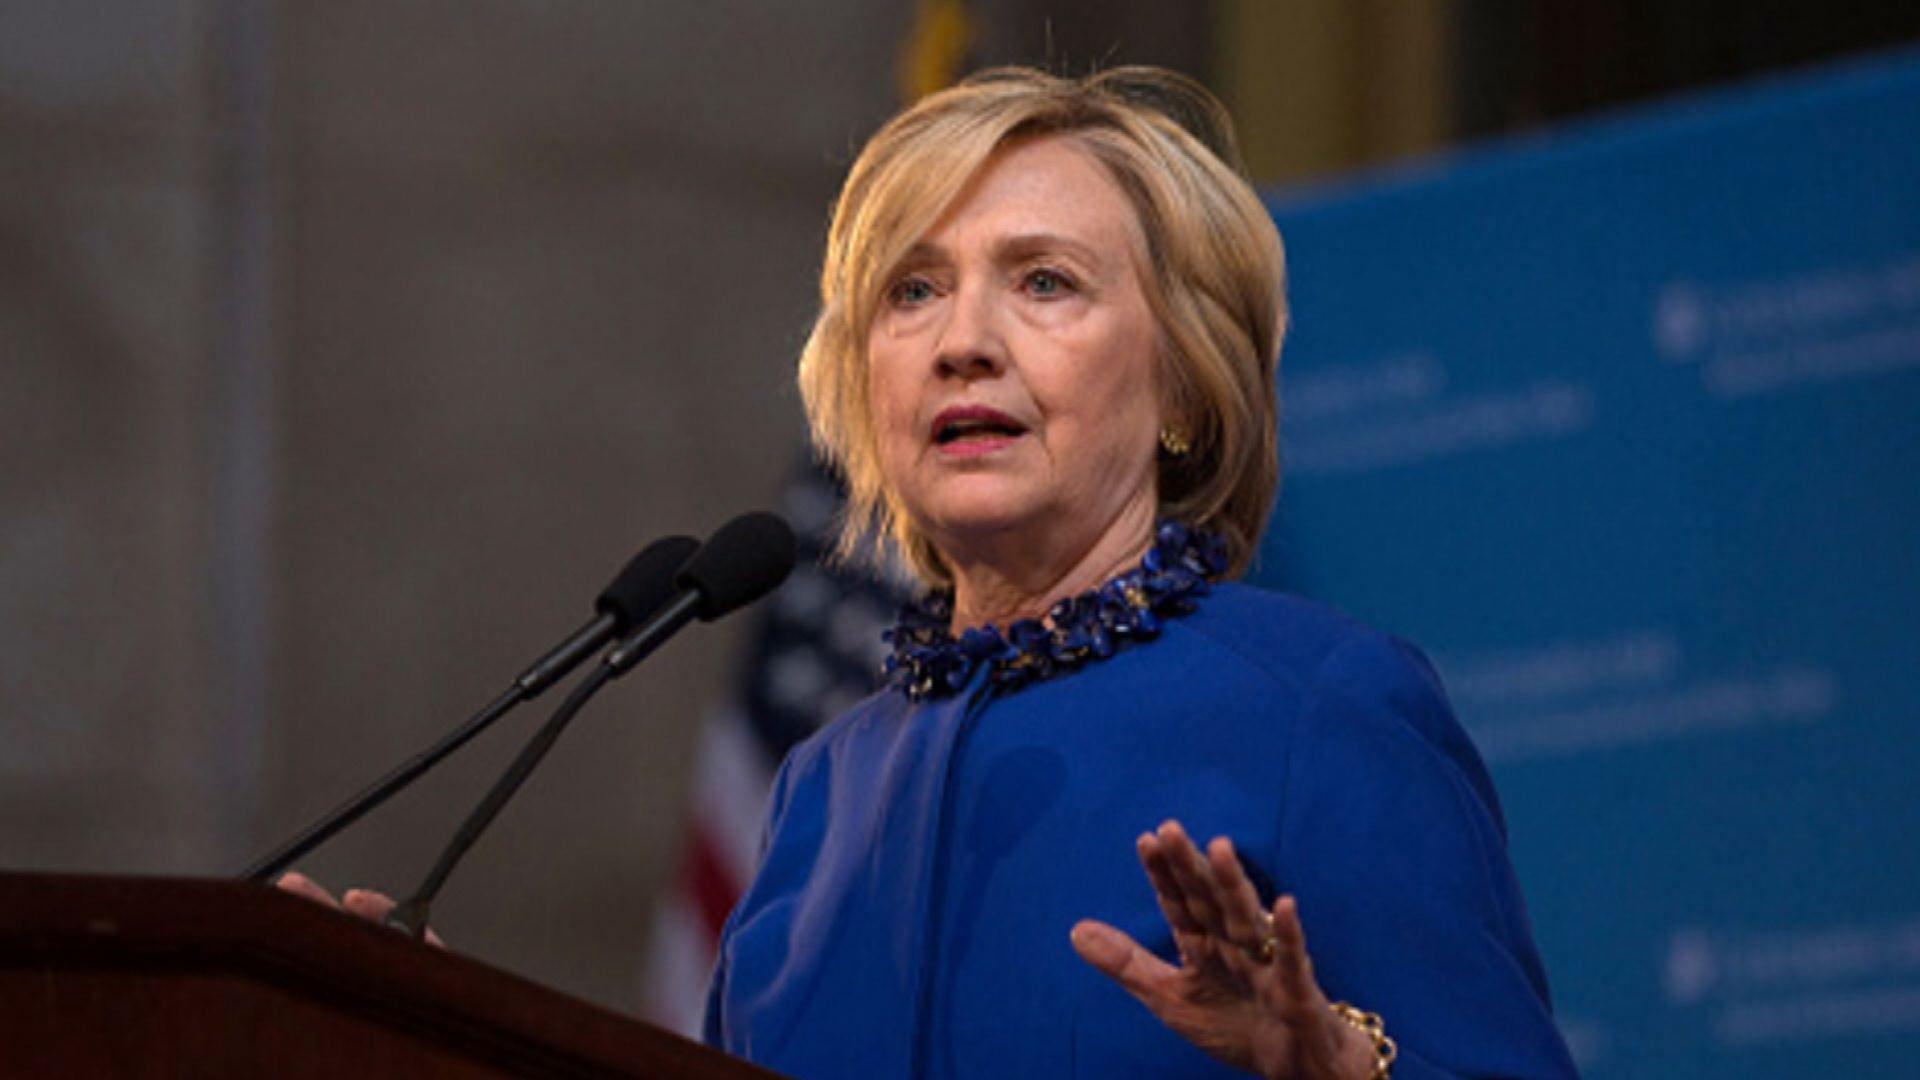 Hillary Clinton Wallpapers Hd